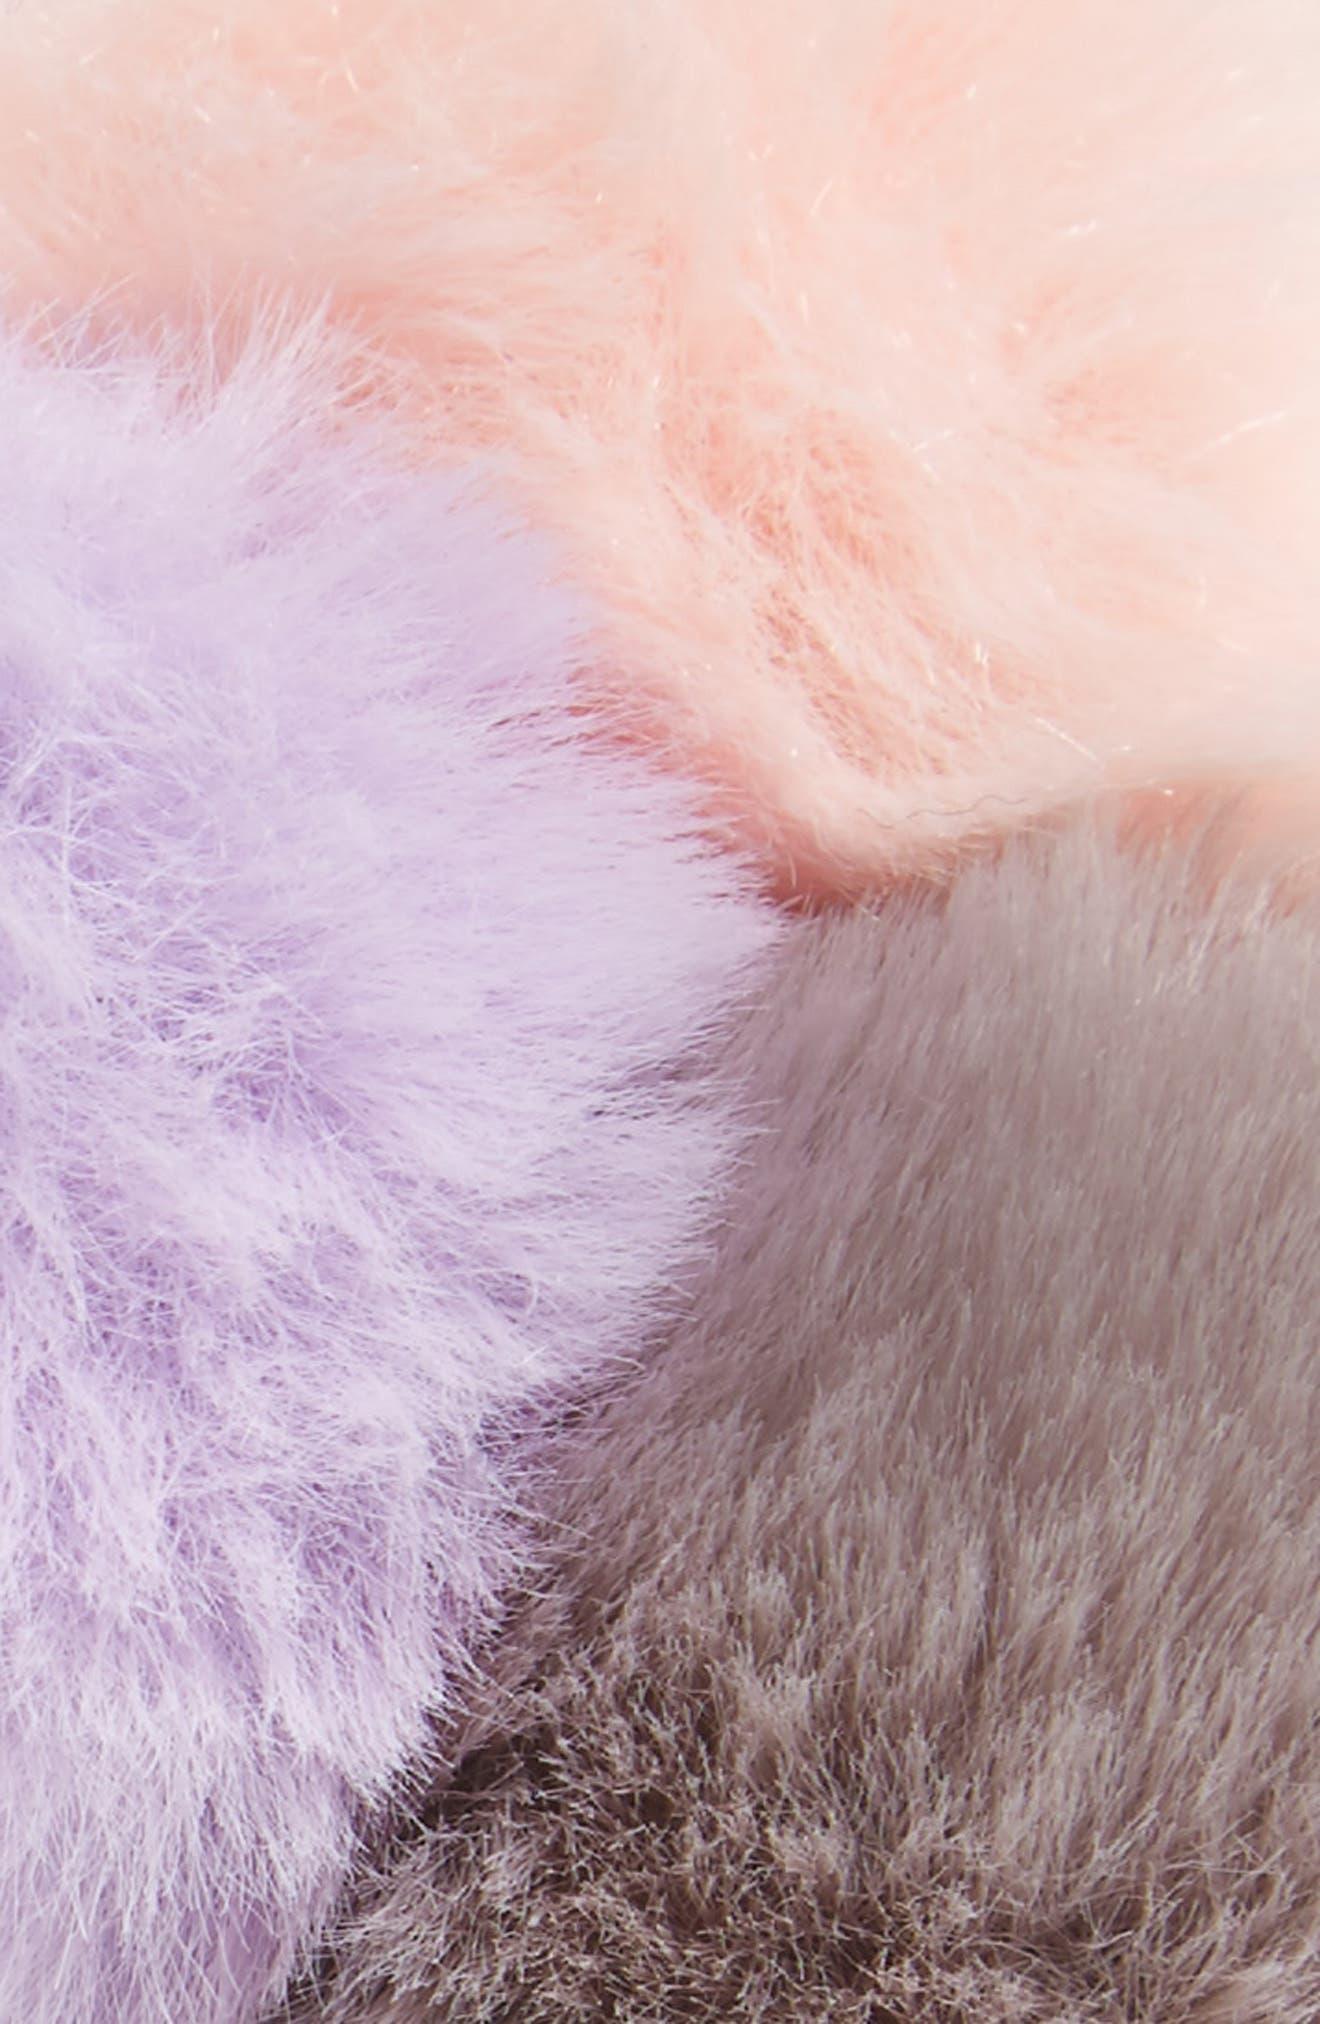 Accessory Collective Pompom Headband,                             Alternate thumbnail 2, color,                             Light Pink/ Gray/ Magenta